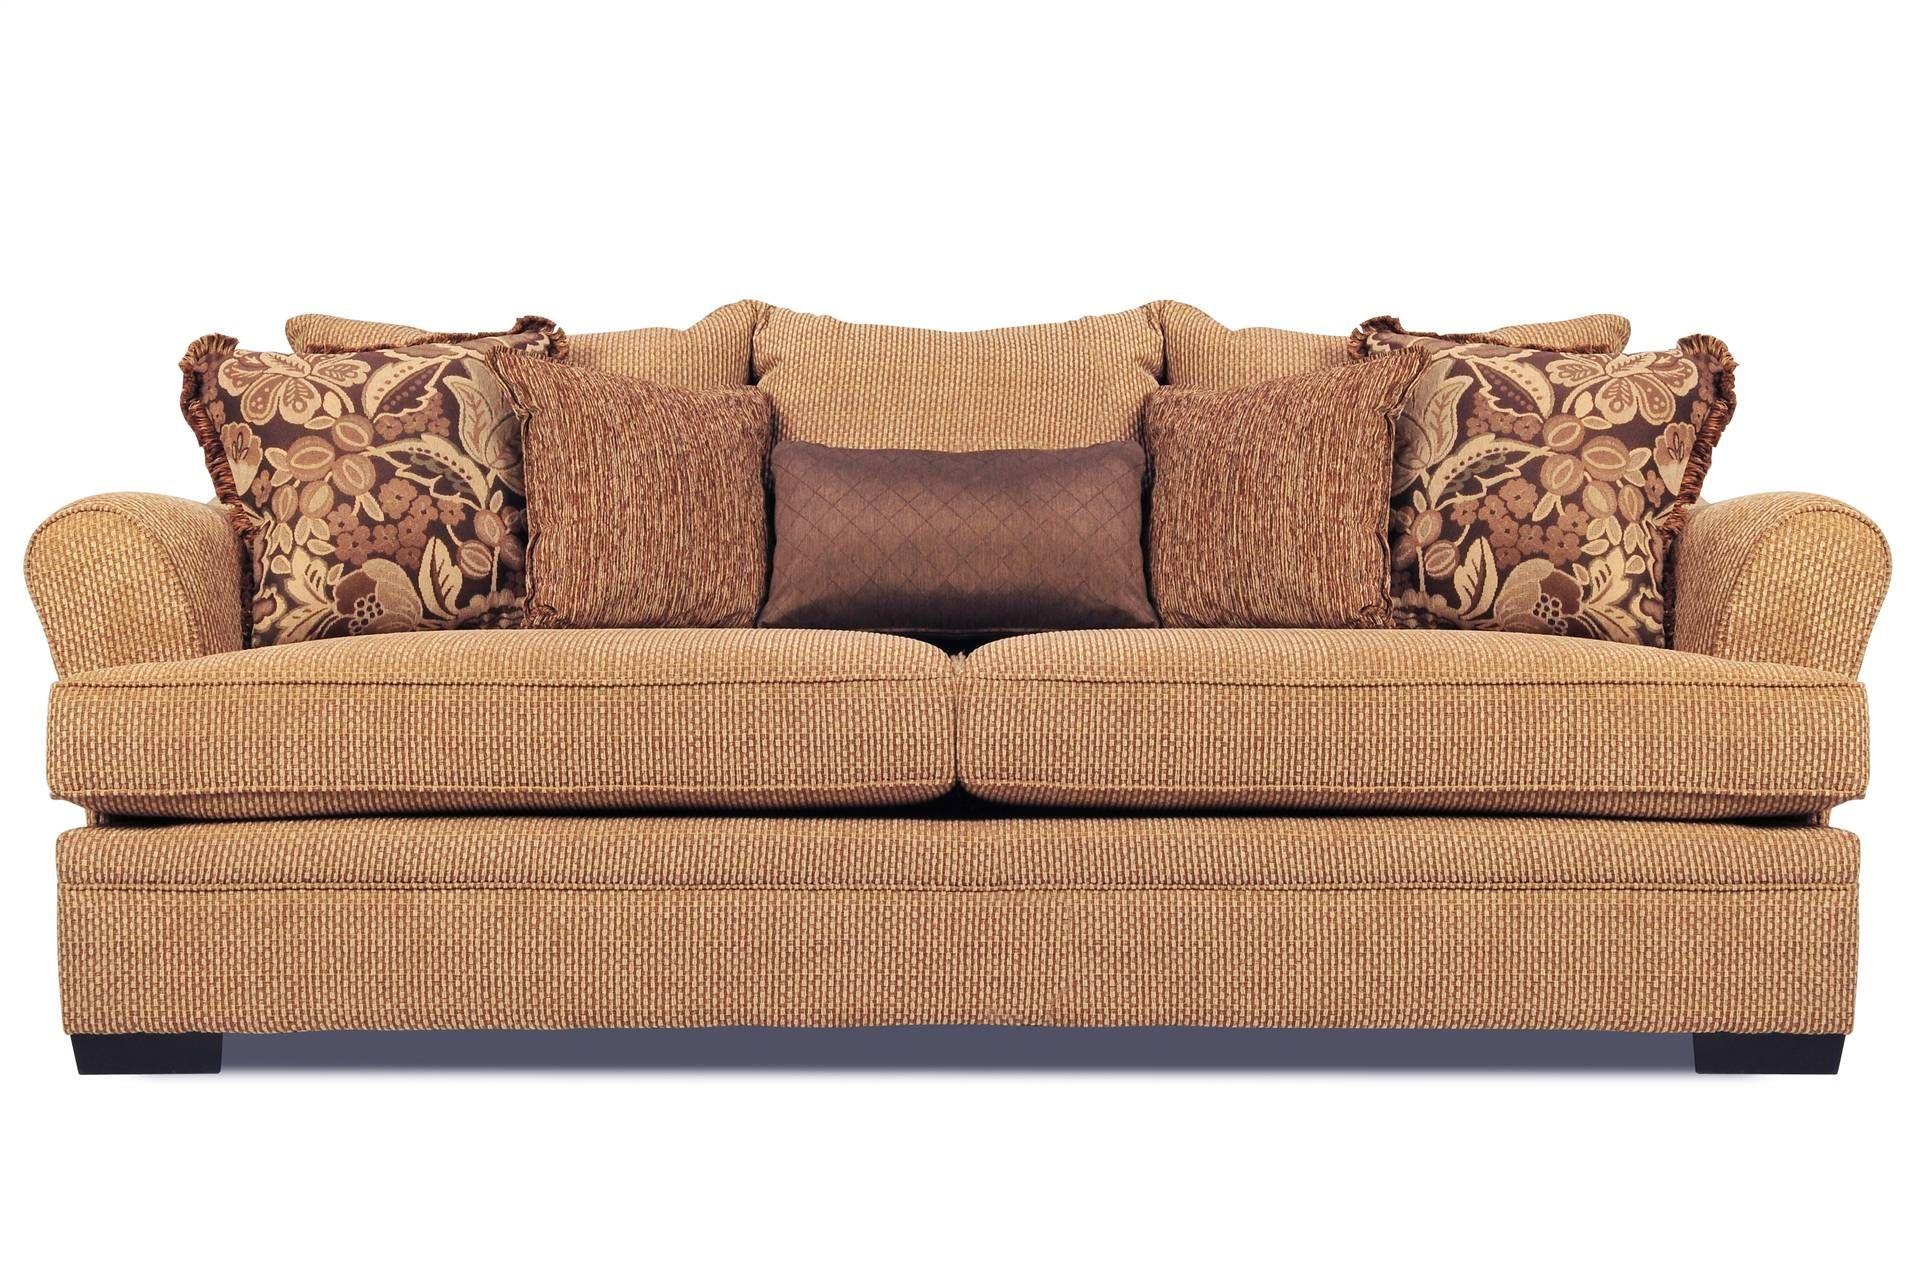 Sofa Tables Online furniture Garland Sofa